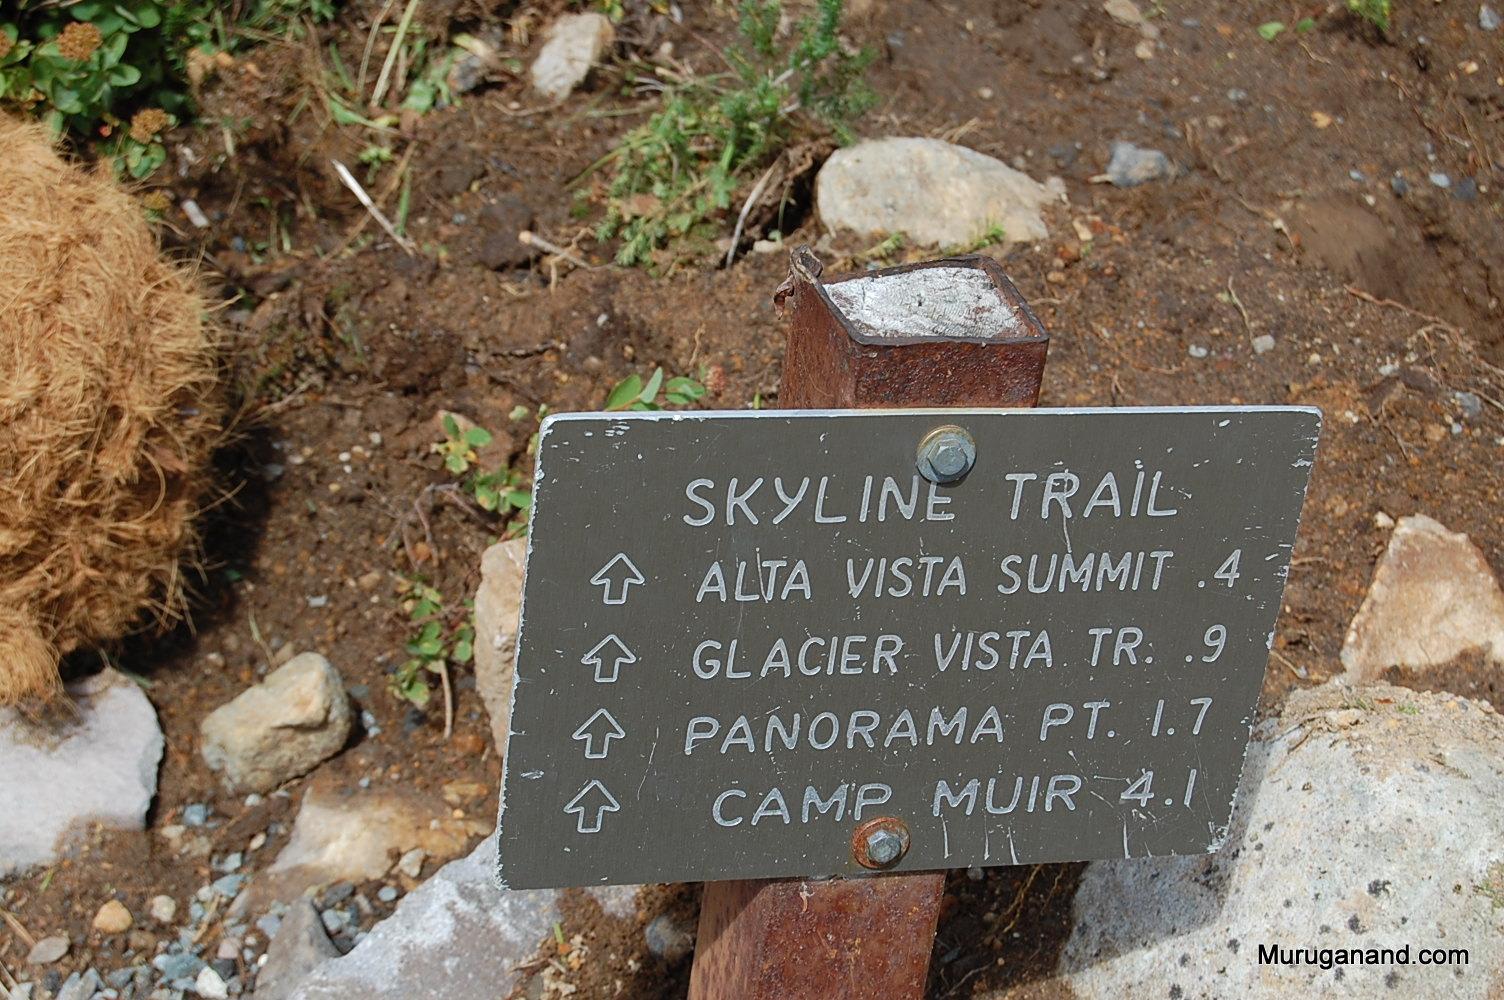 I took the alta vista/skyline trail